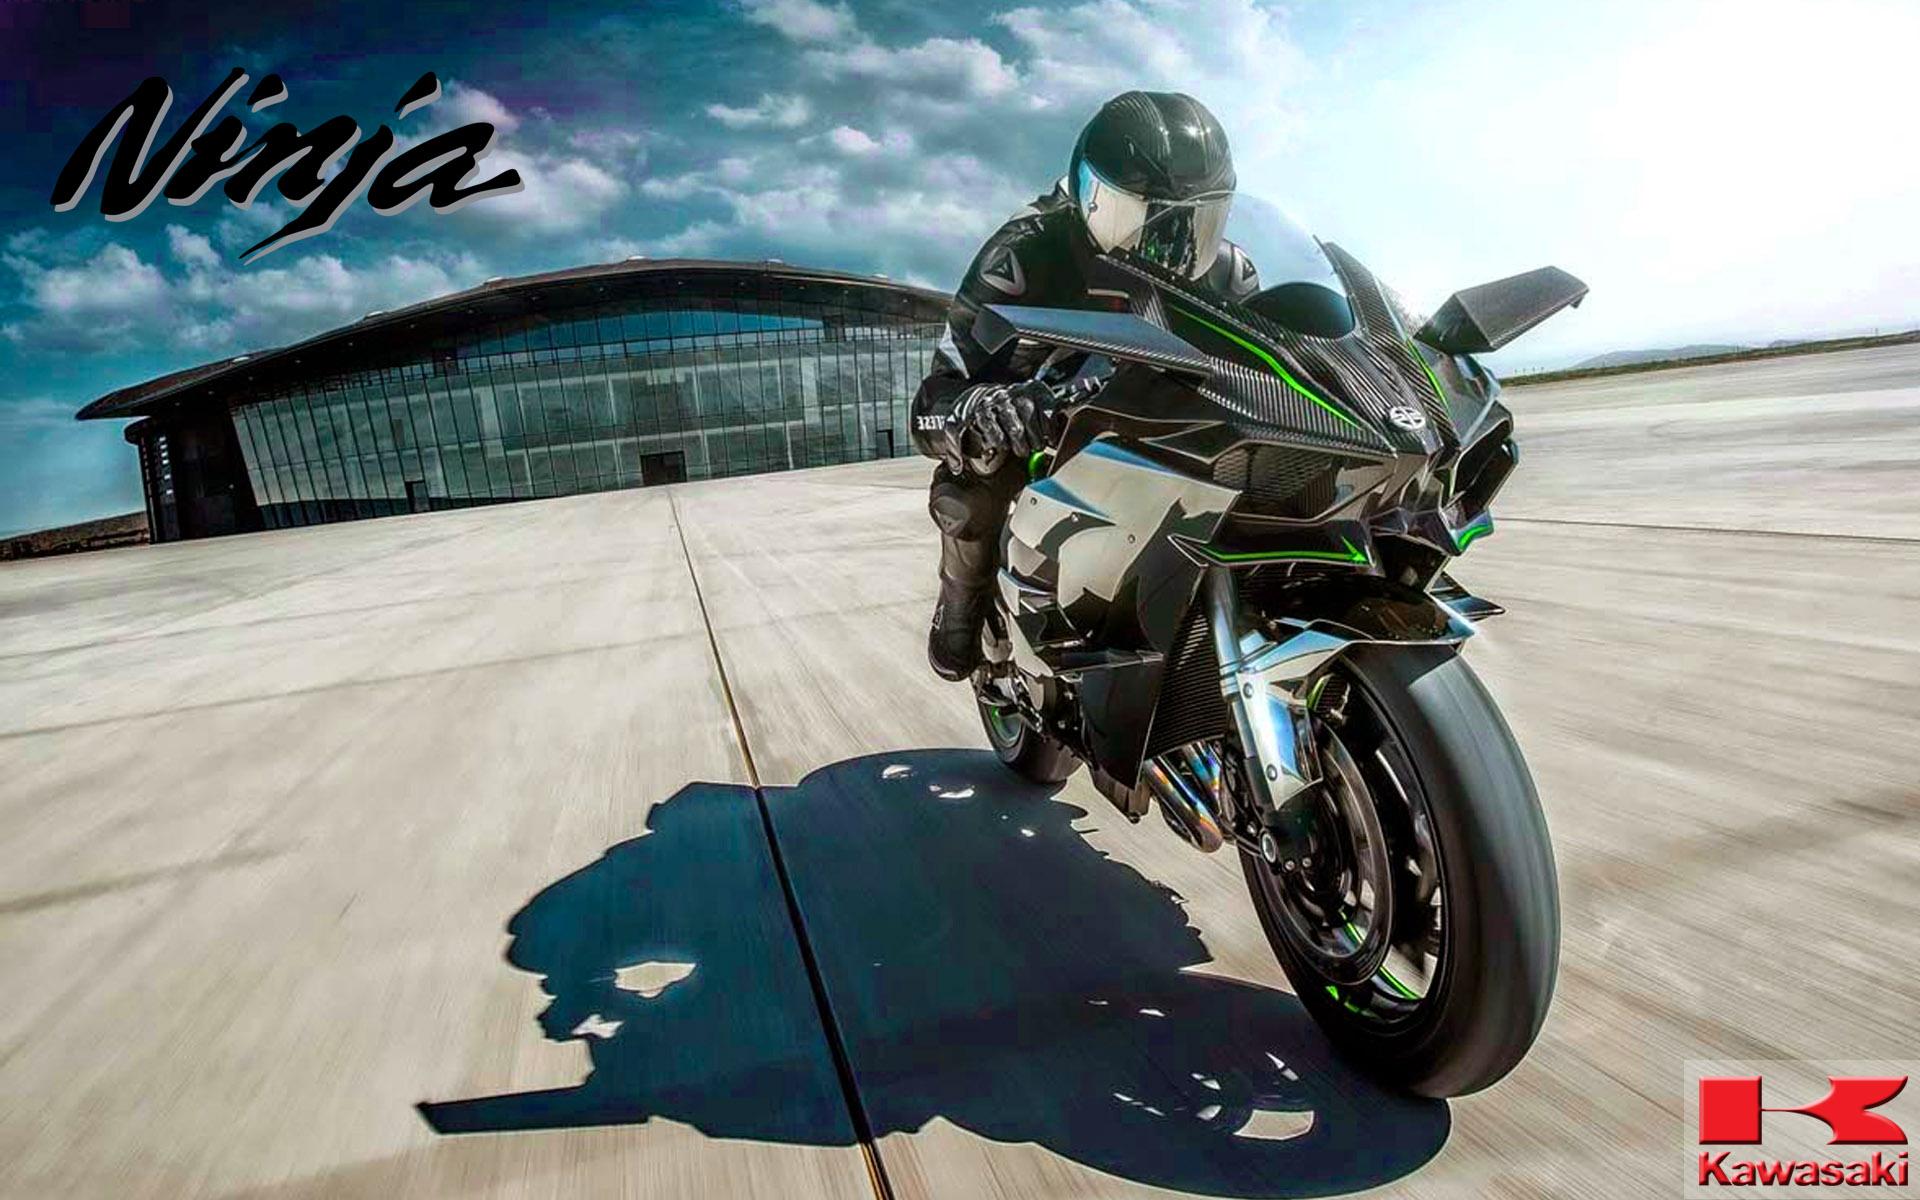 Free Download Kawasaki Ninja H2r Wallpapers HD